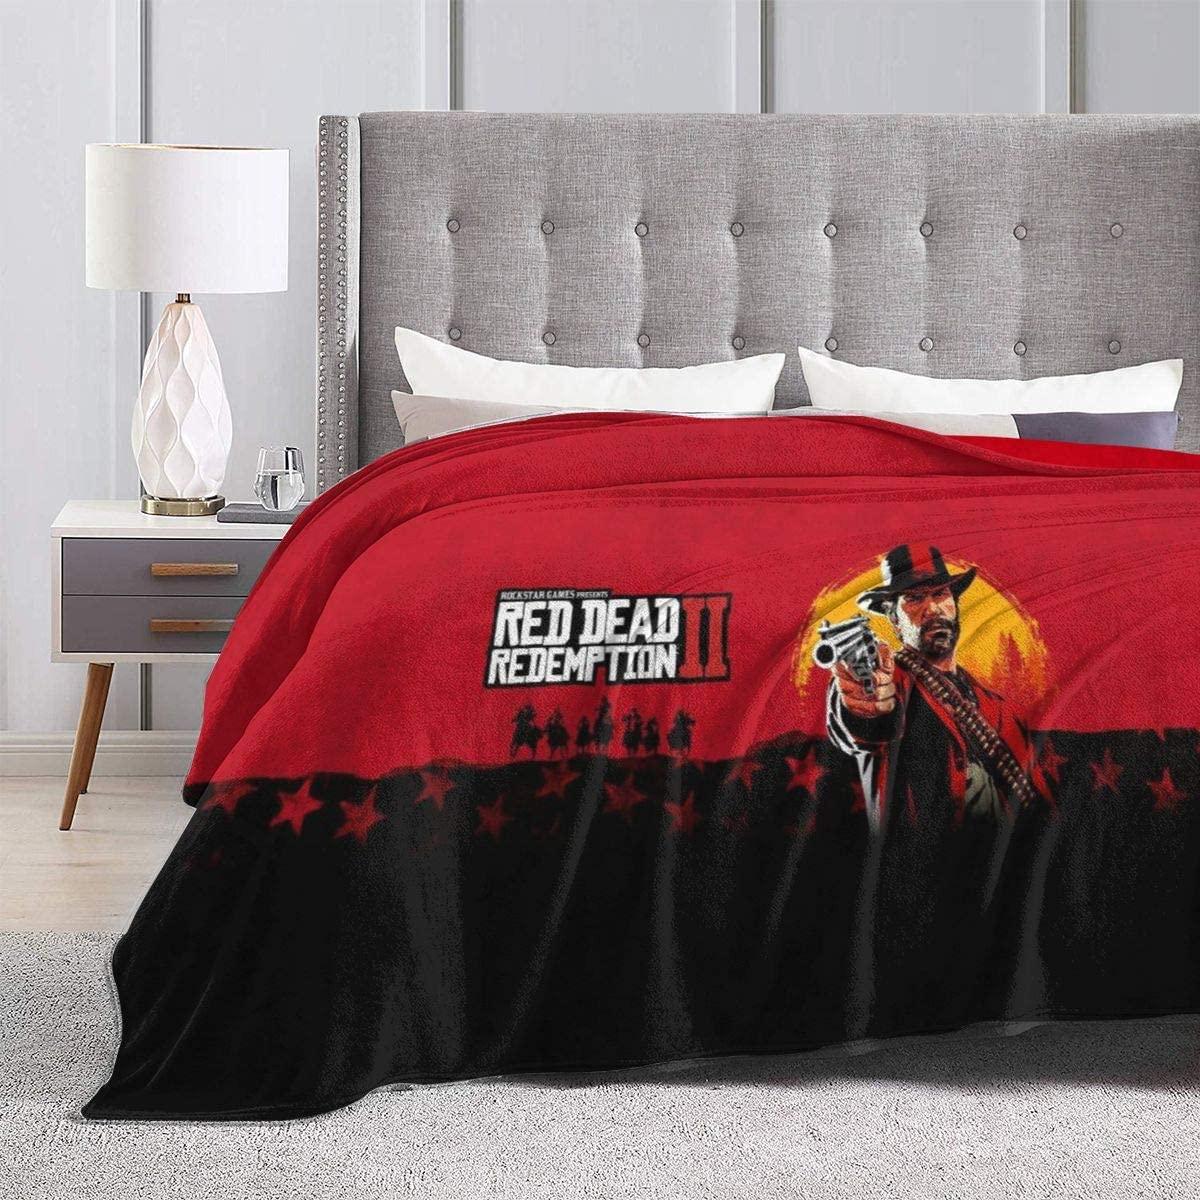 Red De-ad Red-em-Ption 2 Ultra Soft Anti-Pilling Flannel Blanket Arthur Morgan Throw Blanket Warm Plush Cozy Soft Blankets 50X60''